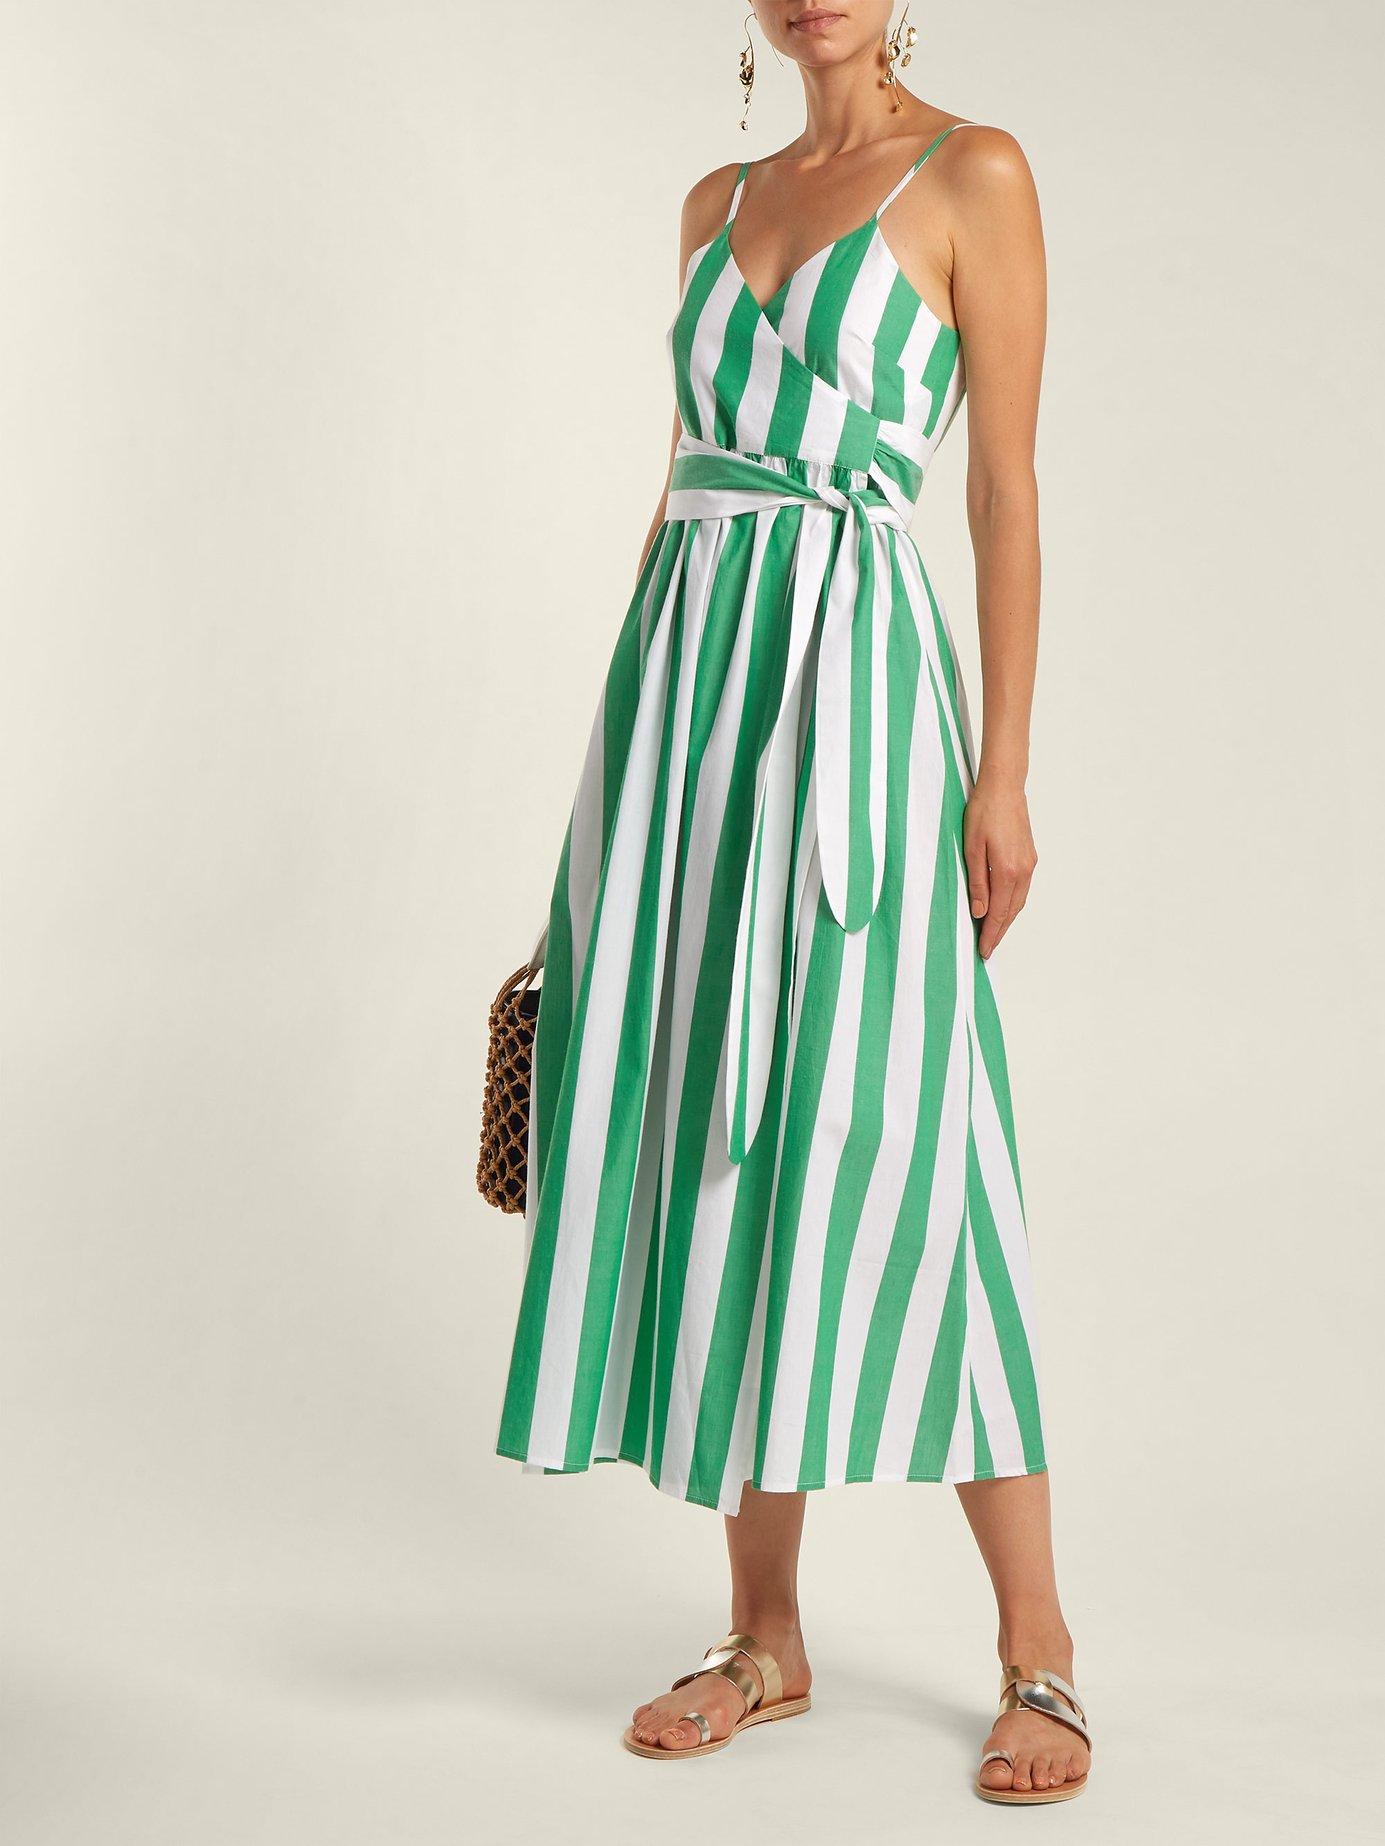 Alma bungalow-stripe wrap dress by Mara Hoffman